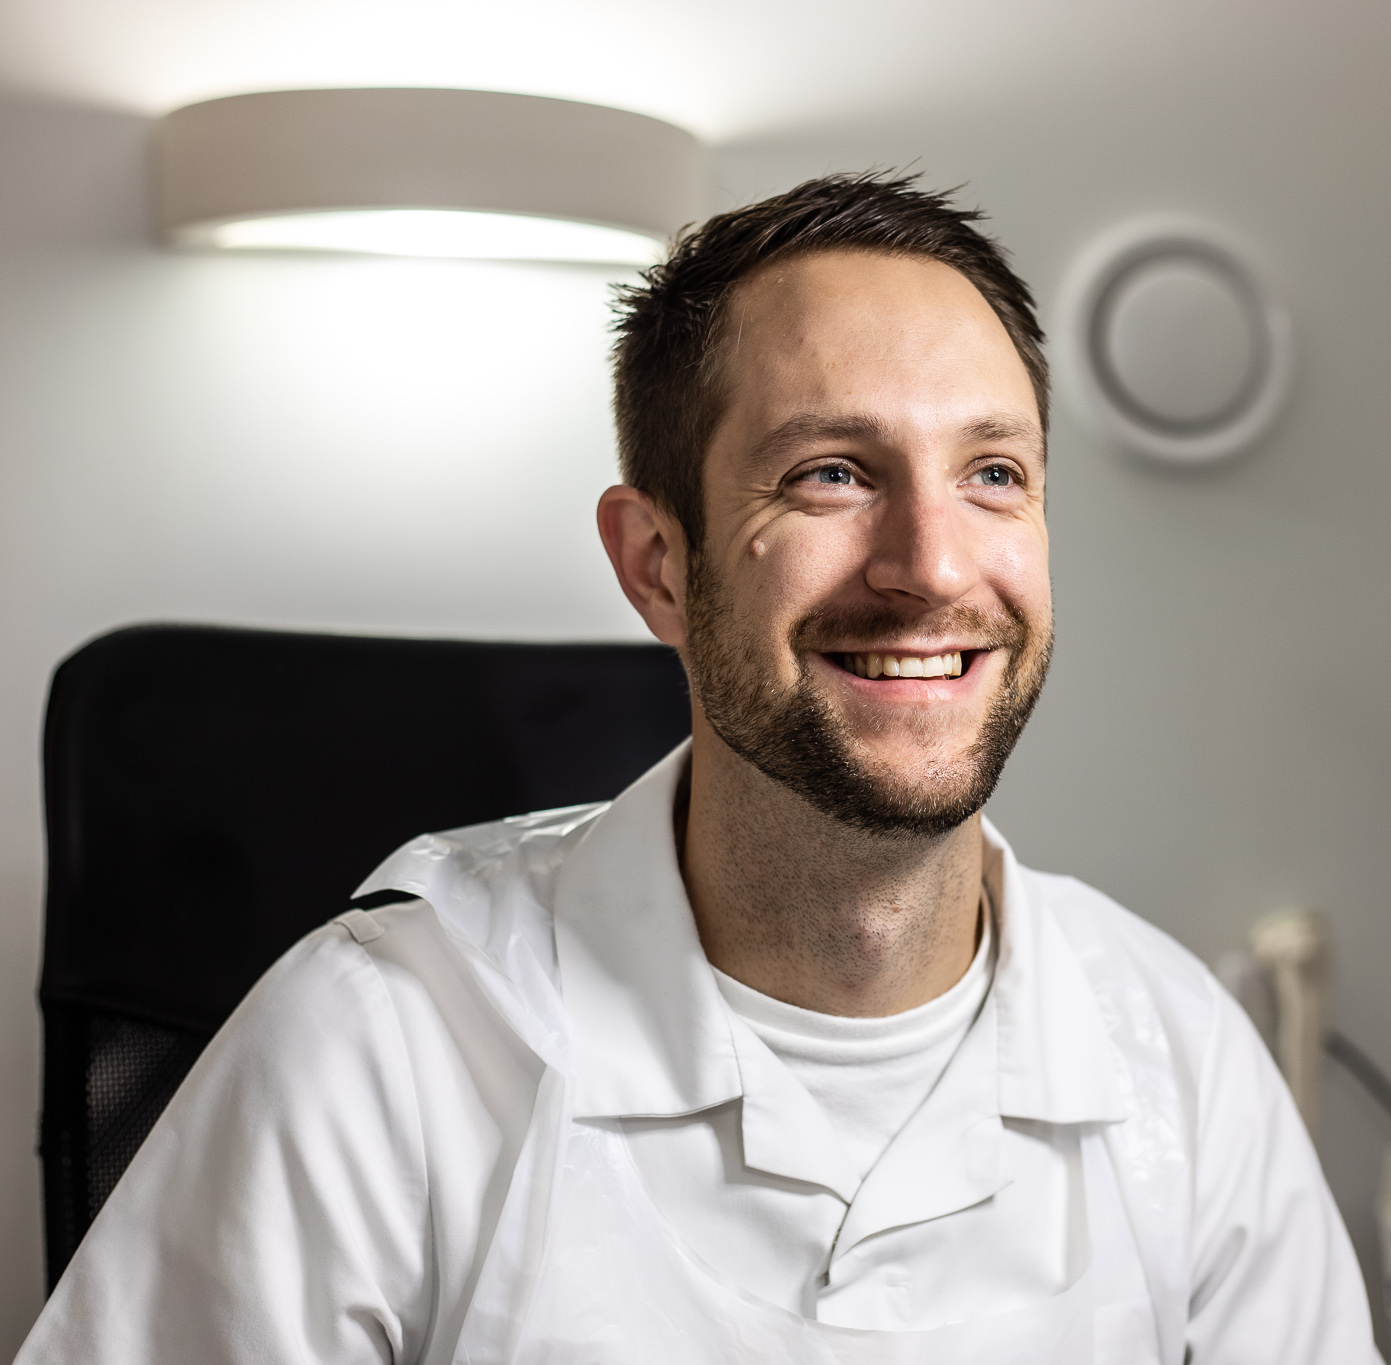 Jamie Luckie podiatrist chiropodist Lilliput Health Poole